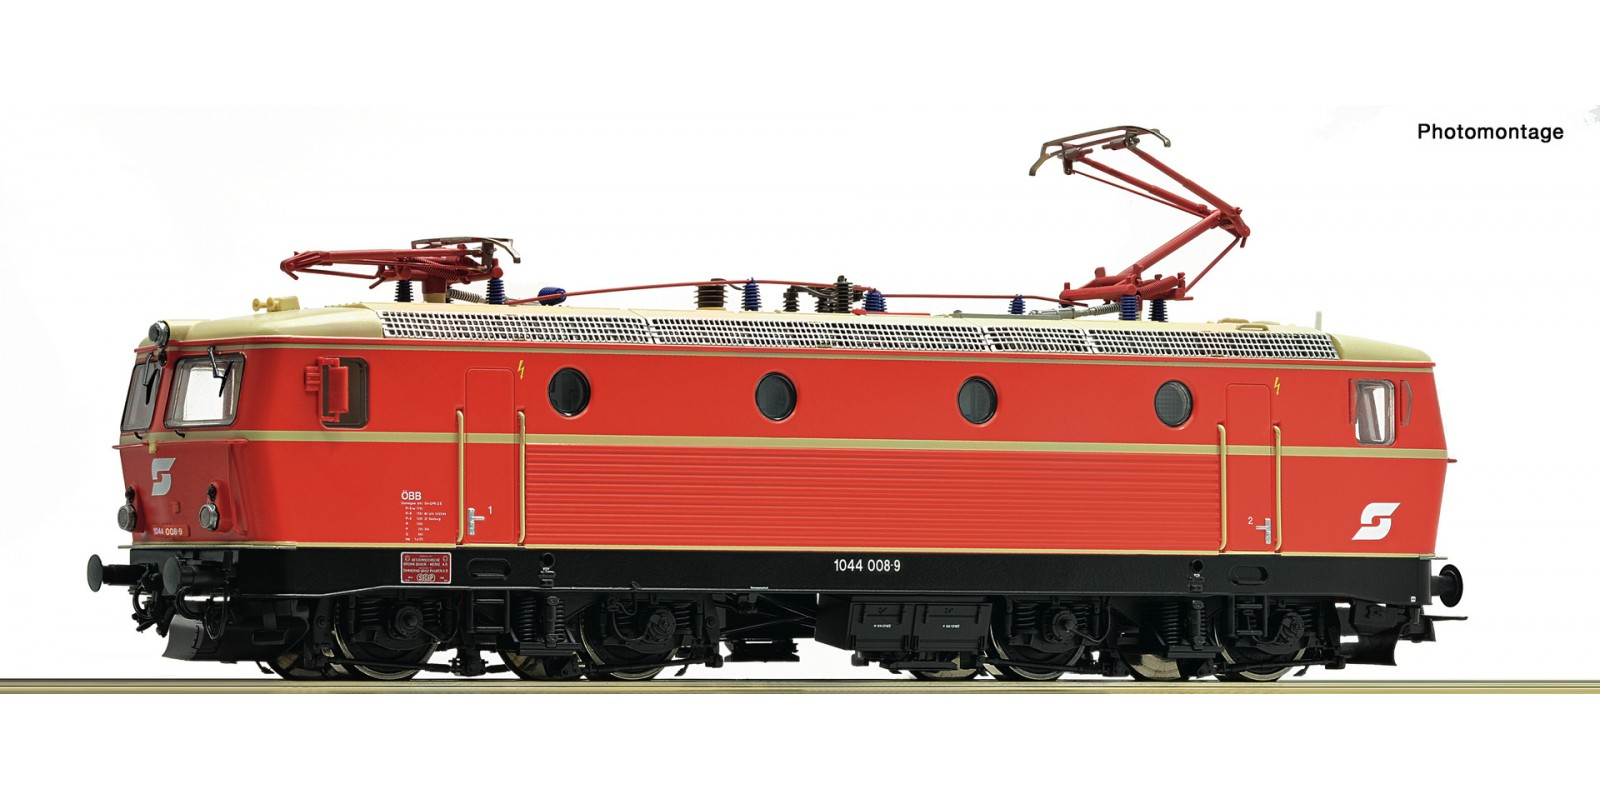 RO73071 - Electric locomotive 1044 008-9, ÖBB